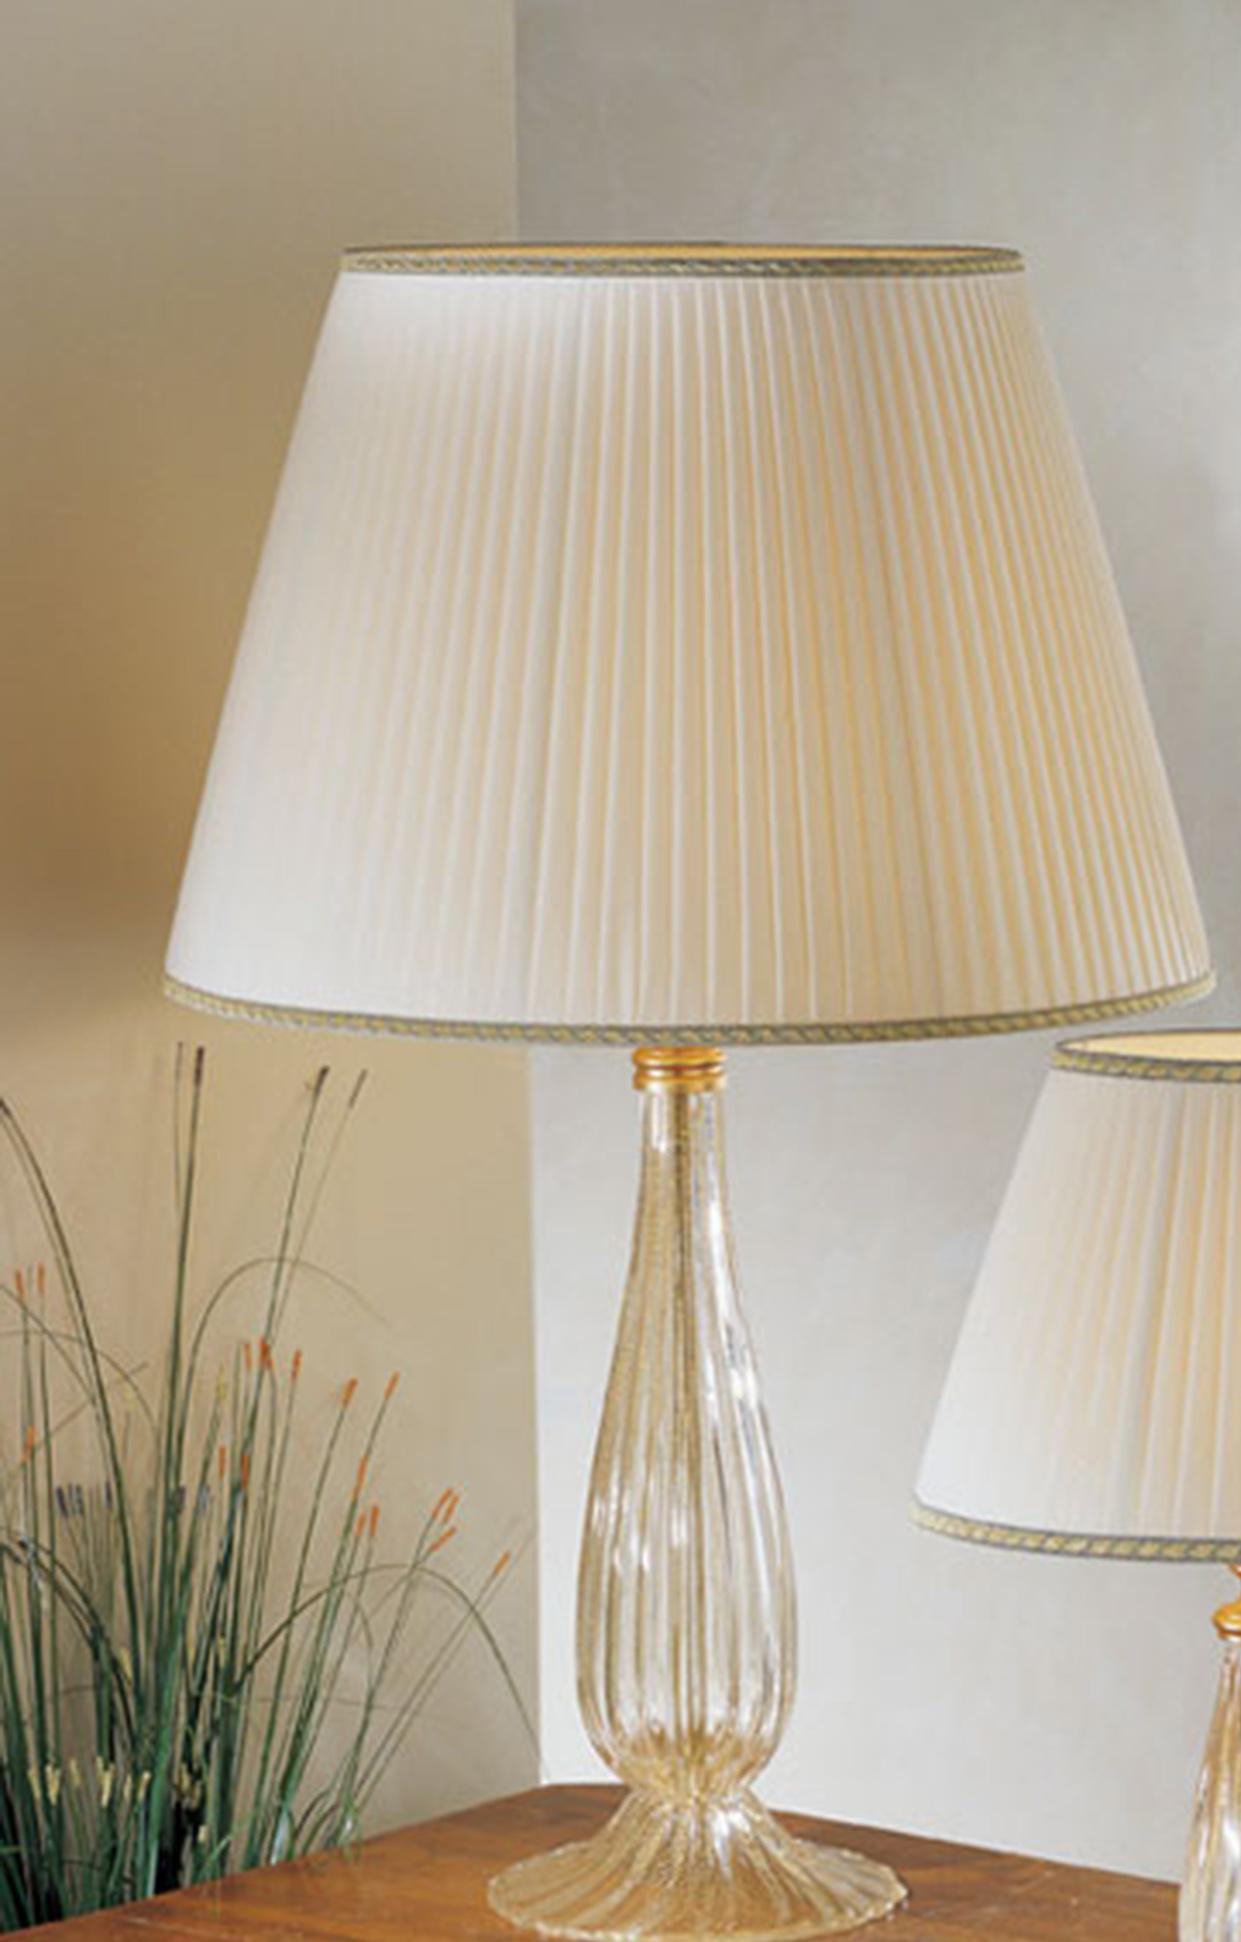 DueP Lampada da tavolo 2325/LP 1 Luce